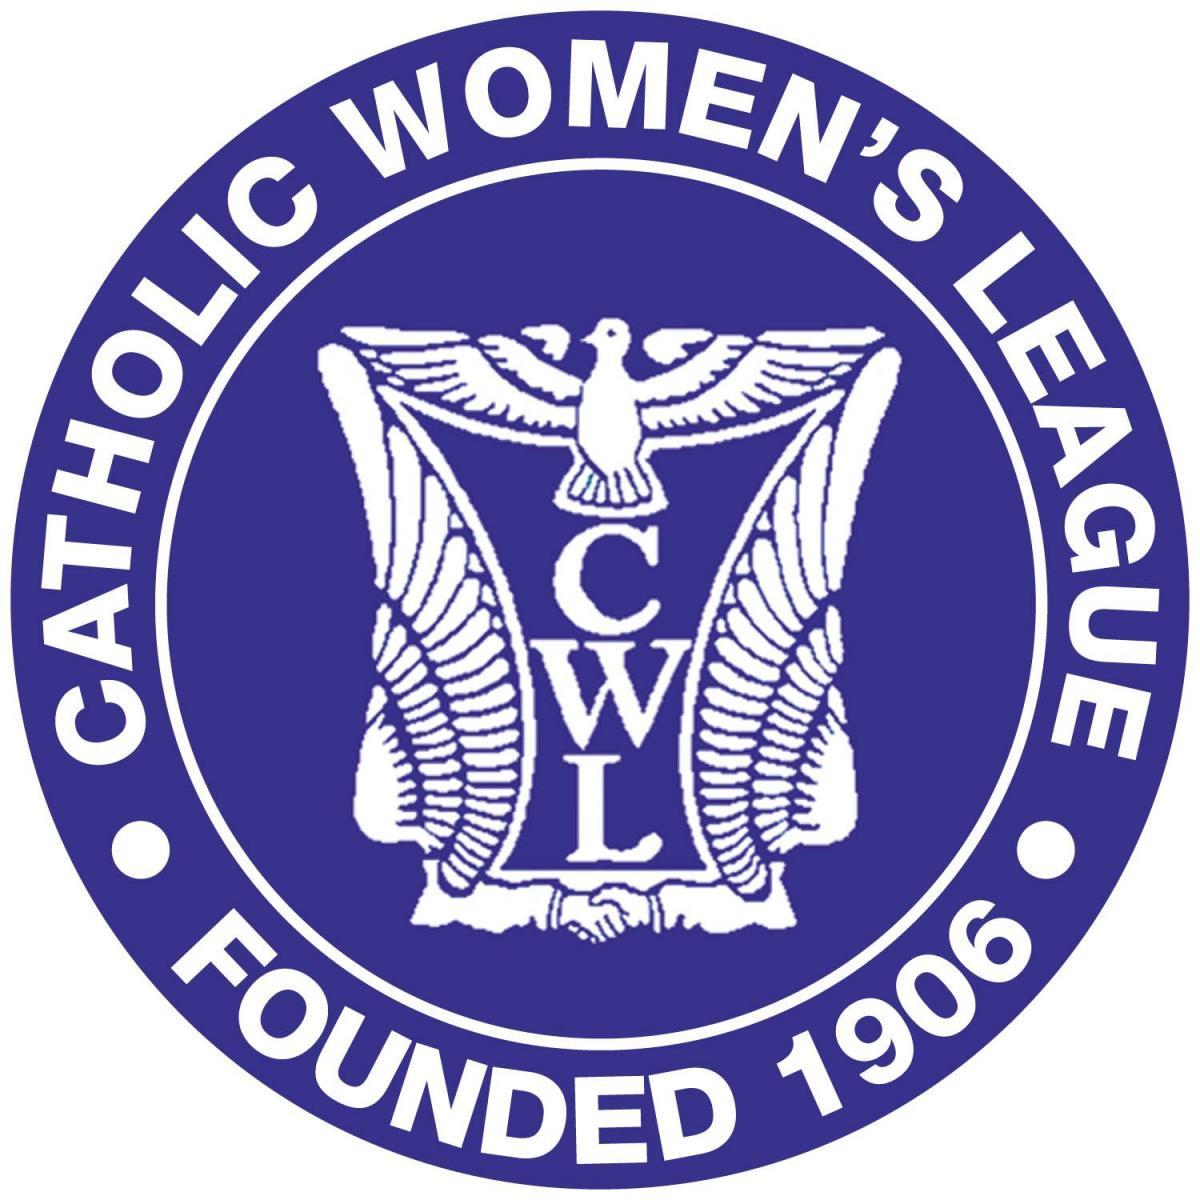 Catholic womens league cwl st peter st thomas more catholic womens league logo biocorpaavc